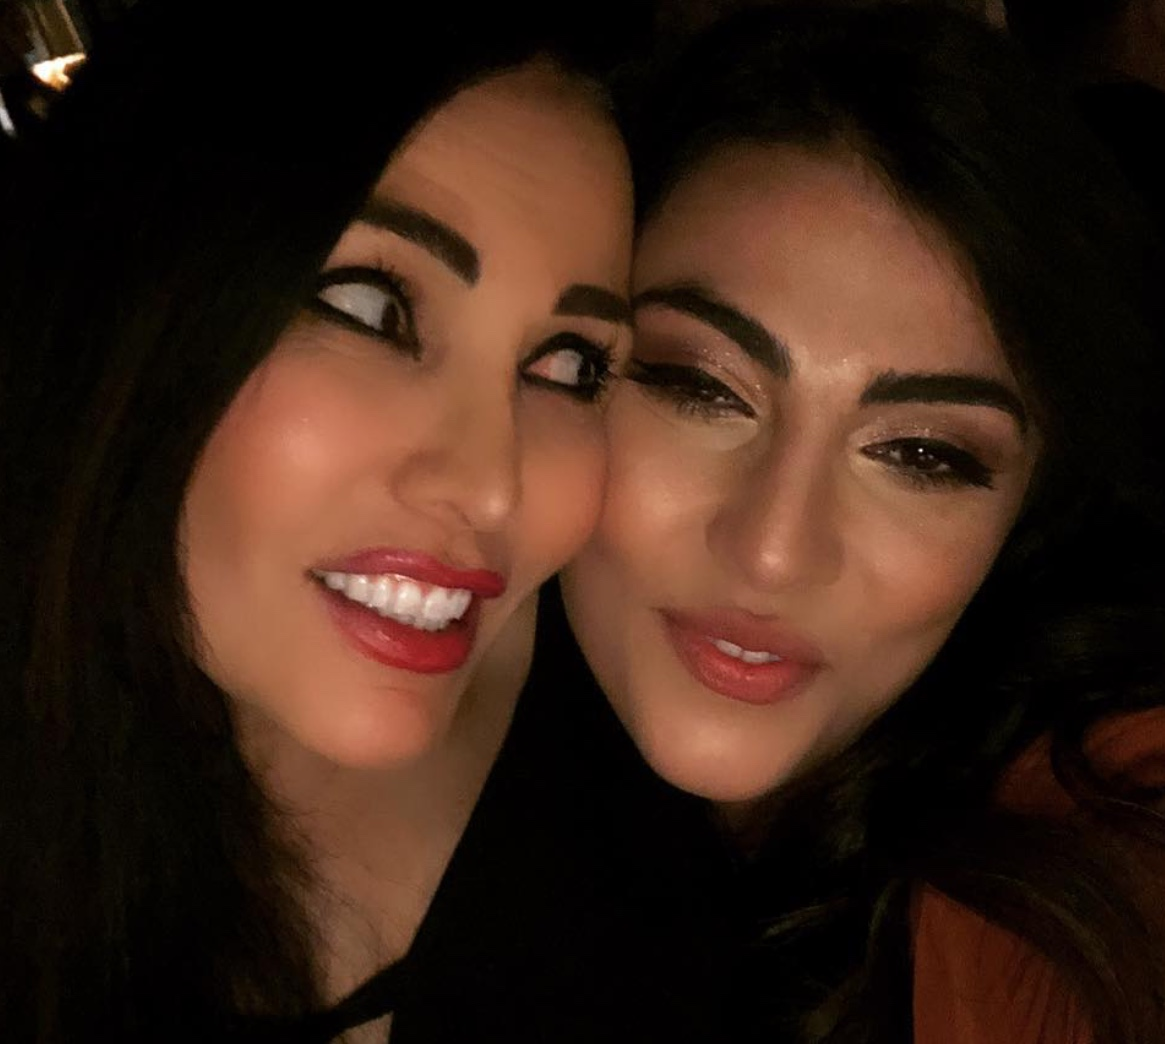 Giulia Salemi e Fariba Tehrani